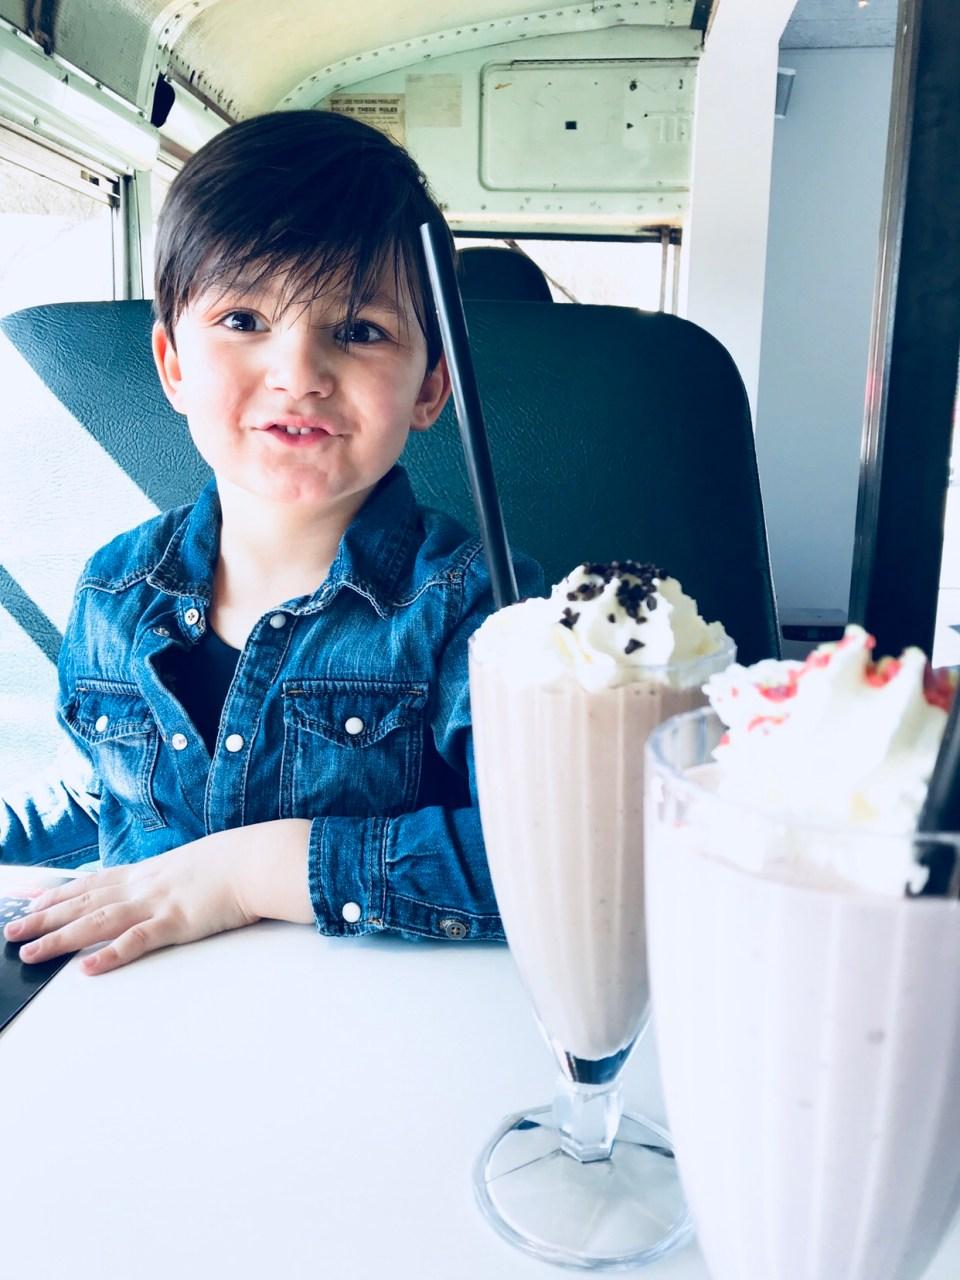 Milkshake Stacy's Diner Køge Marina